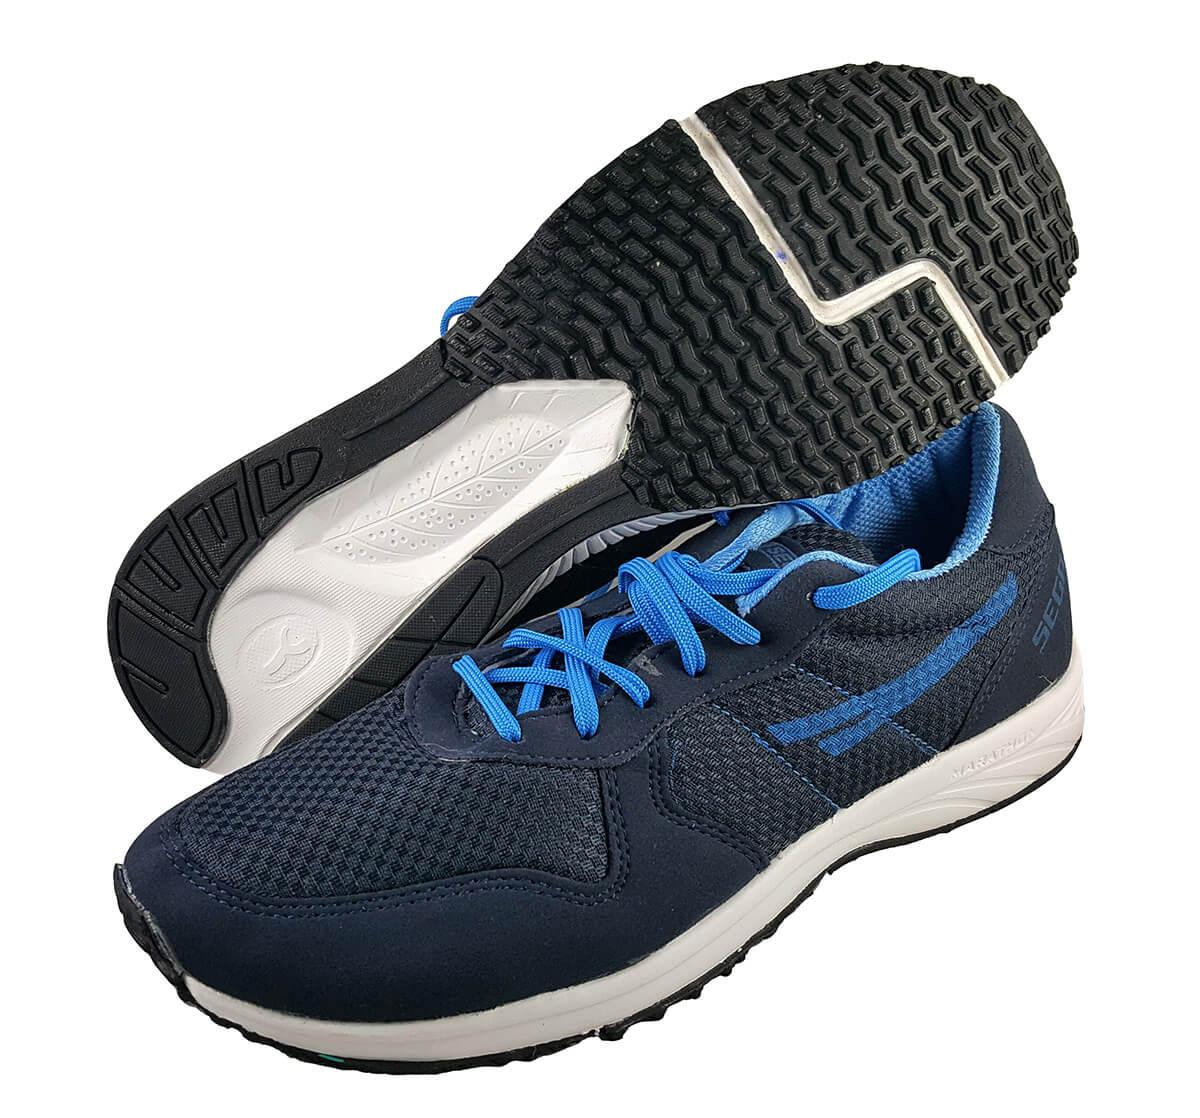 Sega New Blue Marathan Running Shoes